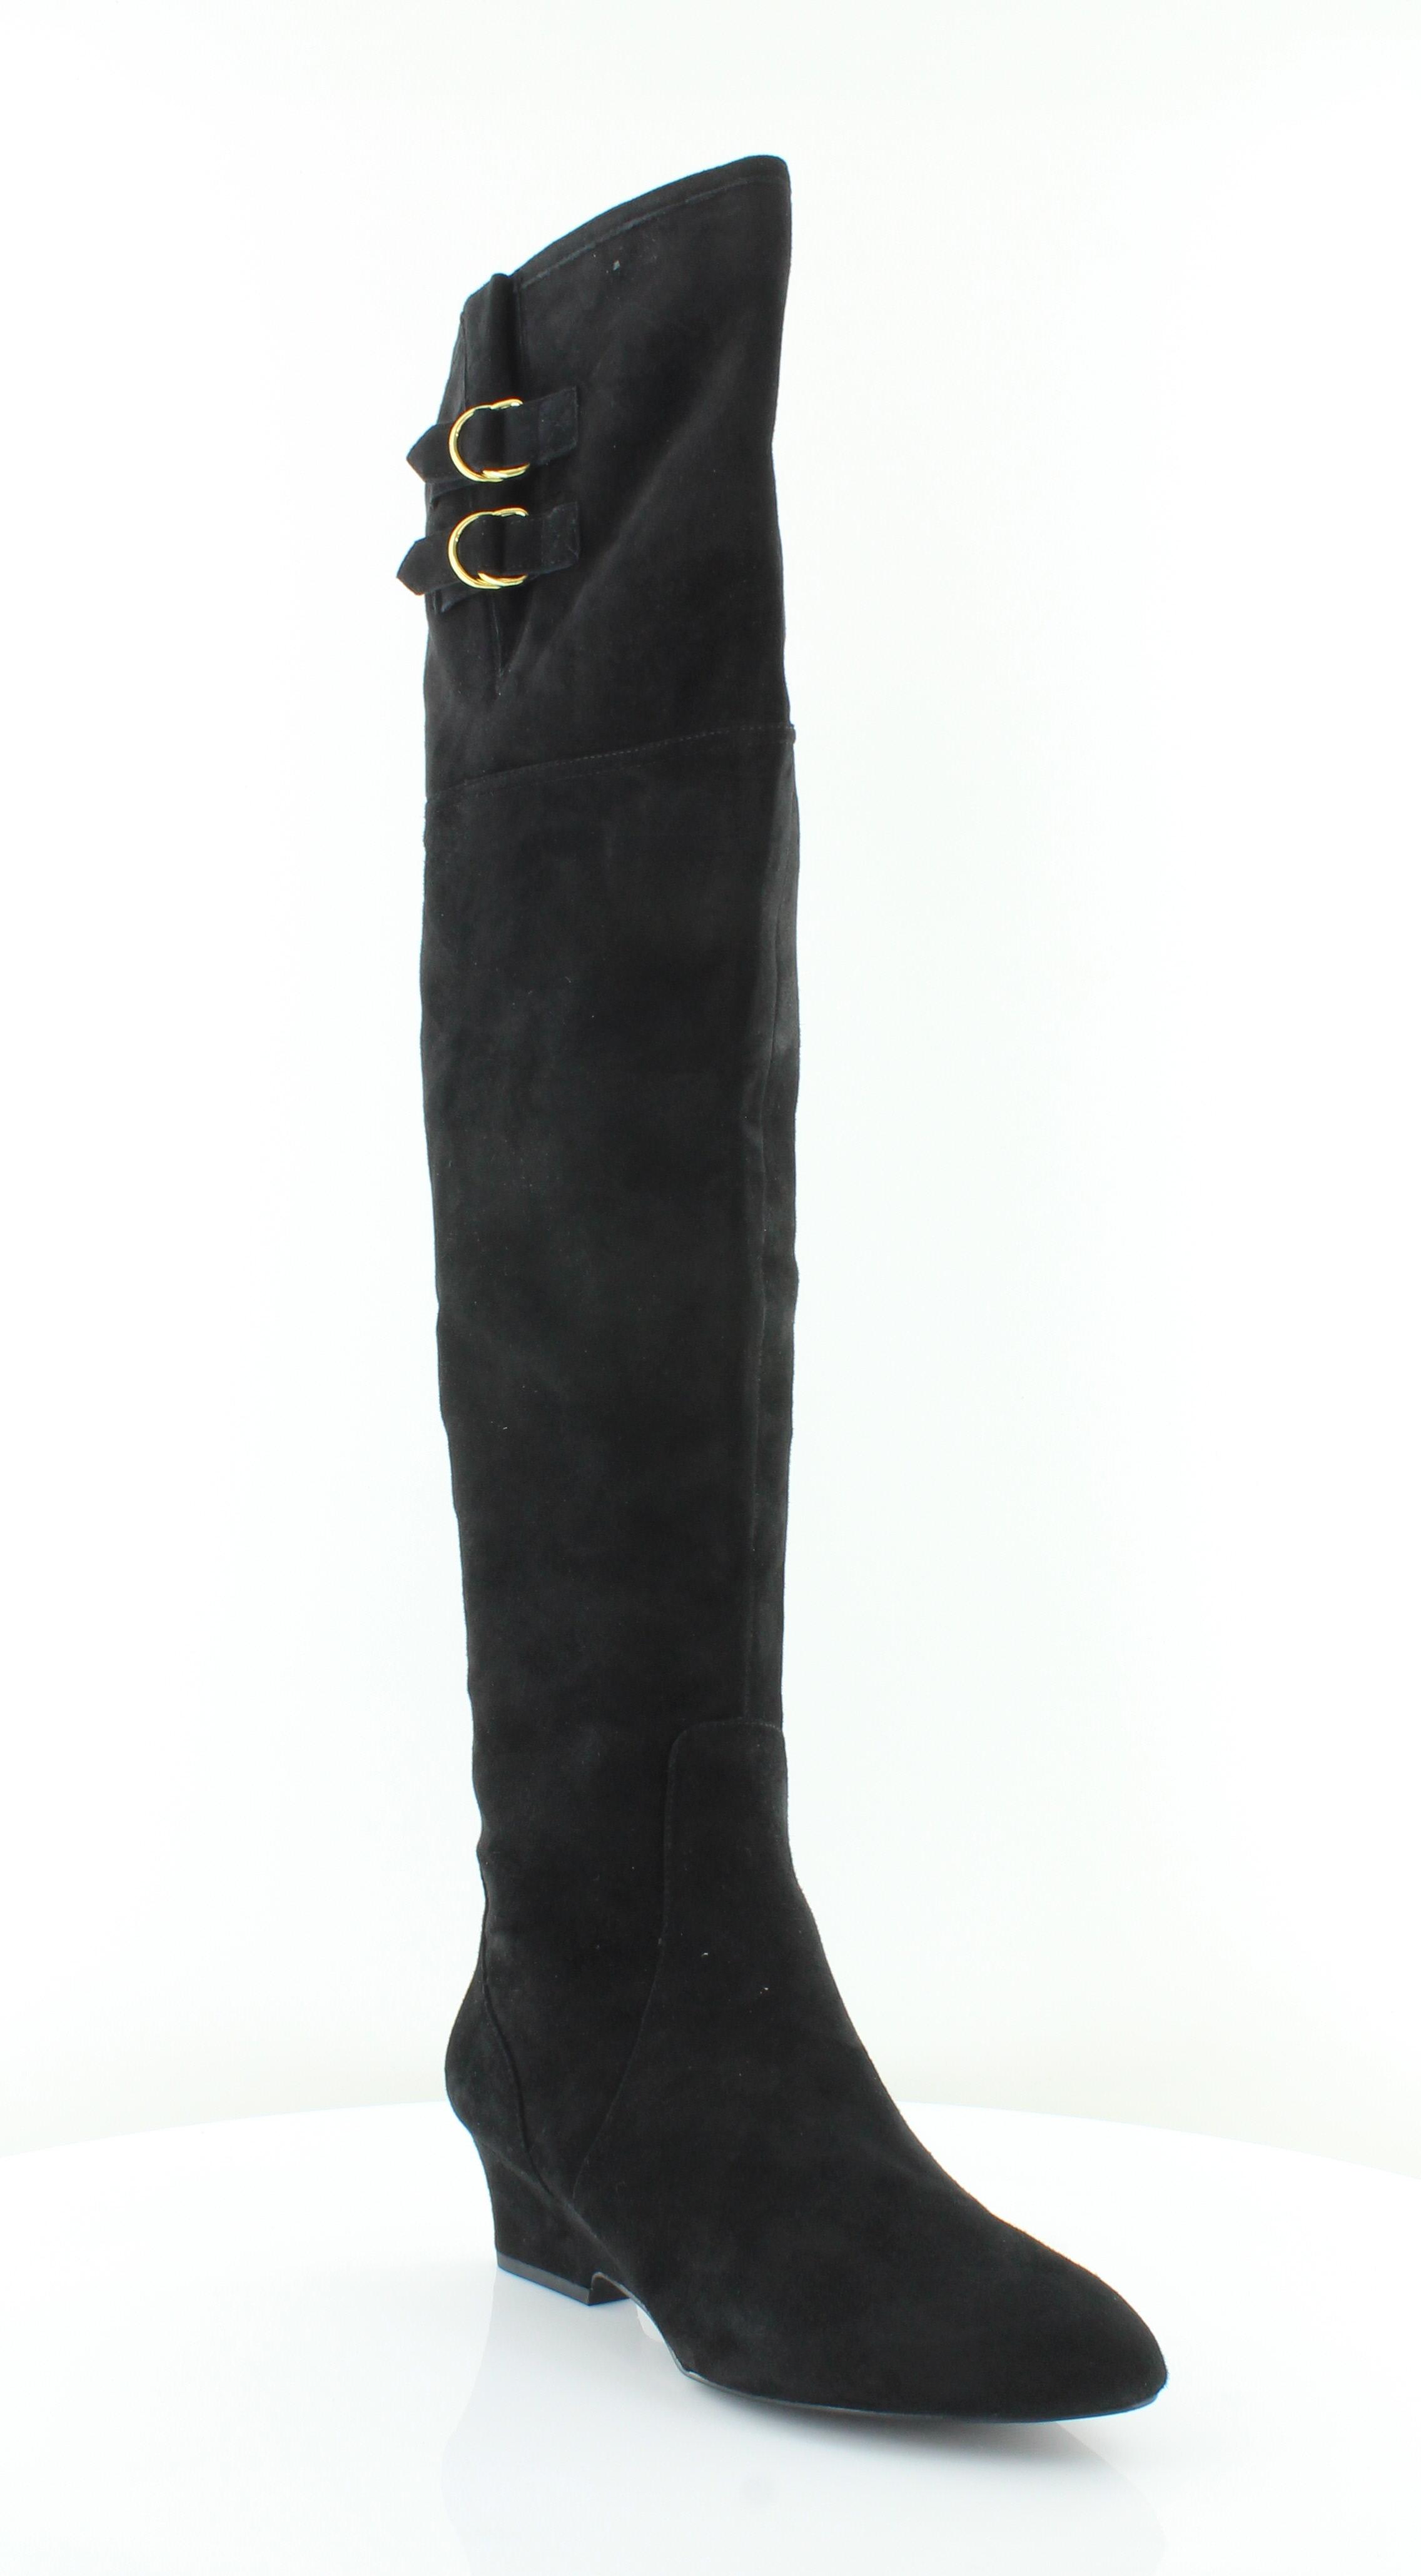 Nine West Jaén para mujer mujer mujer botas Negro  compra limitada